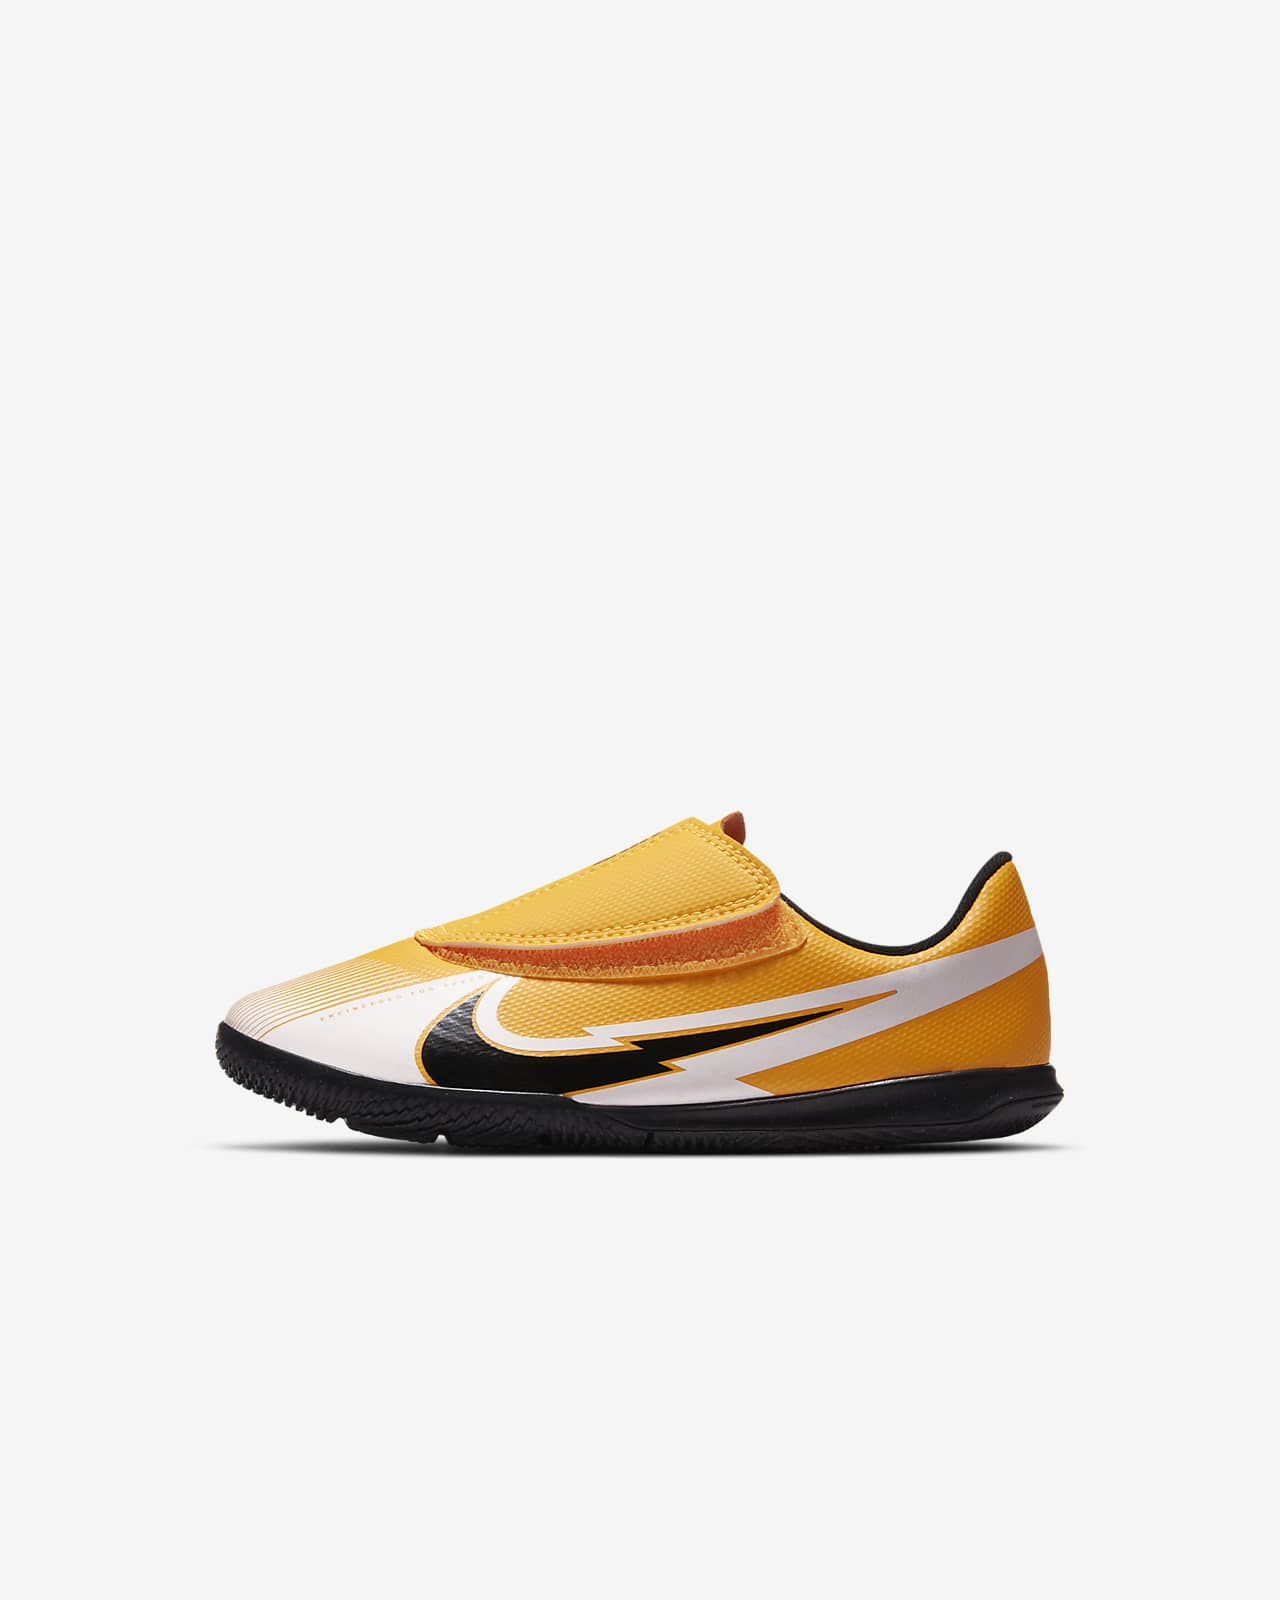 Chaussure de football en salle Nike Jr. Mercurial Vapor 13 Club IC ...